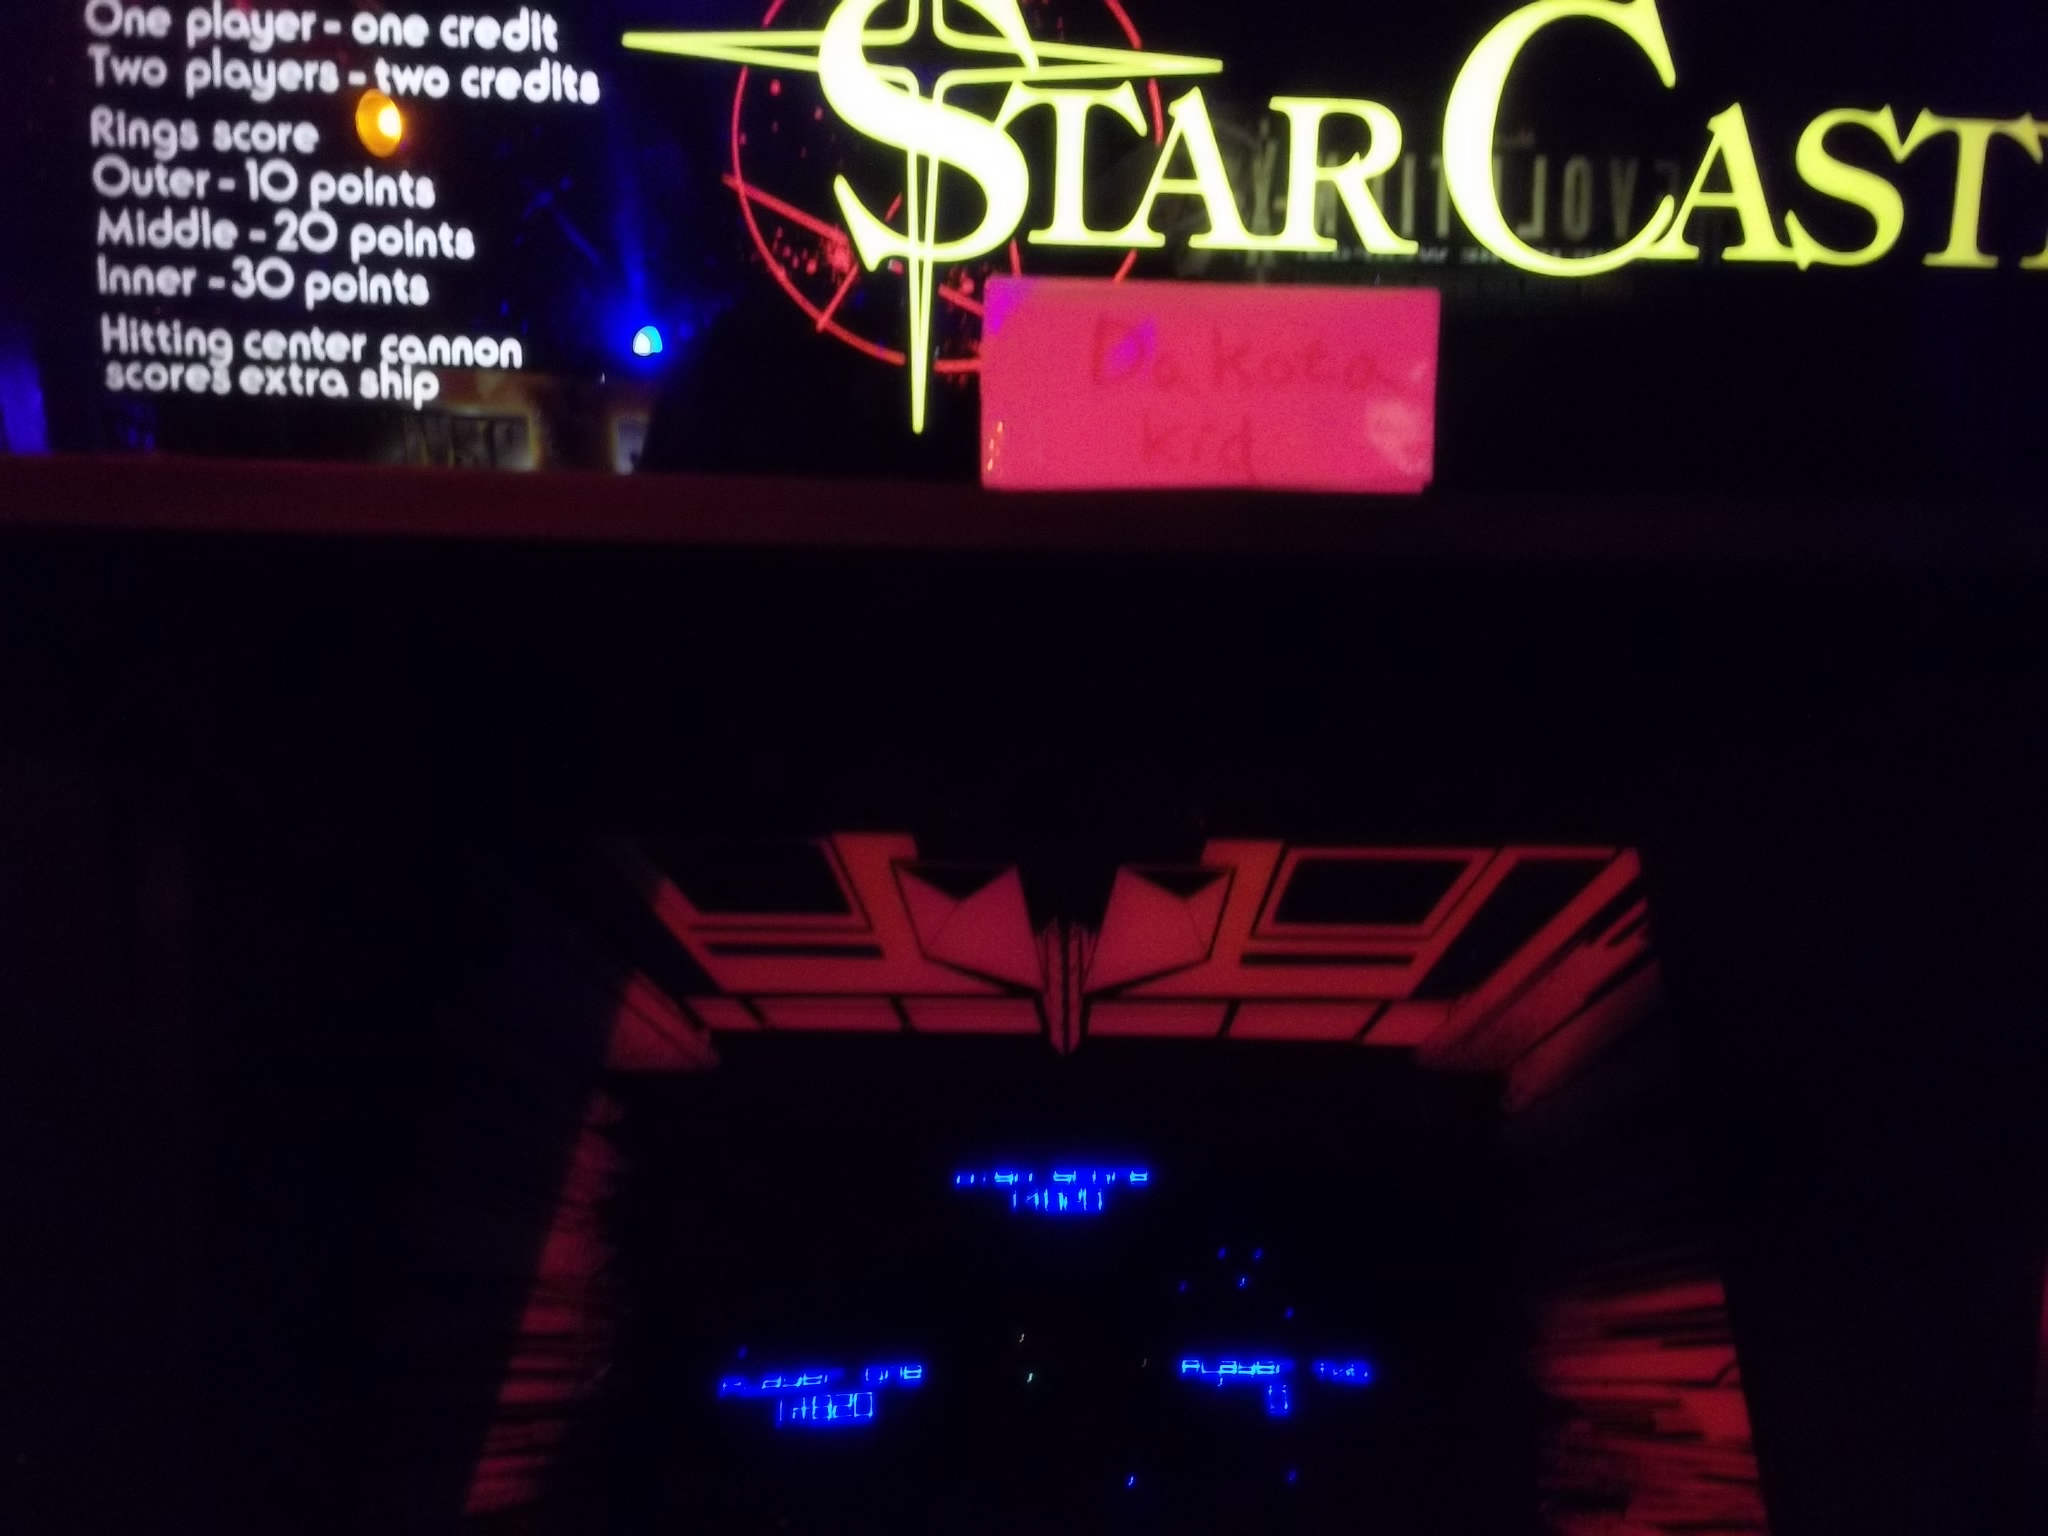 Star Castle 14,820 points